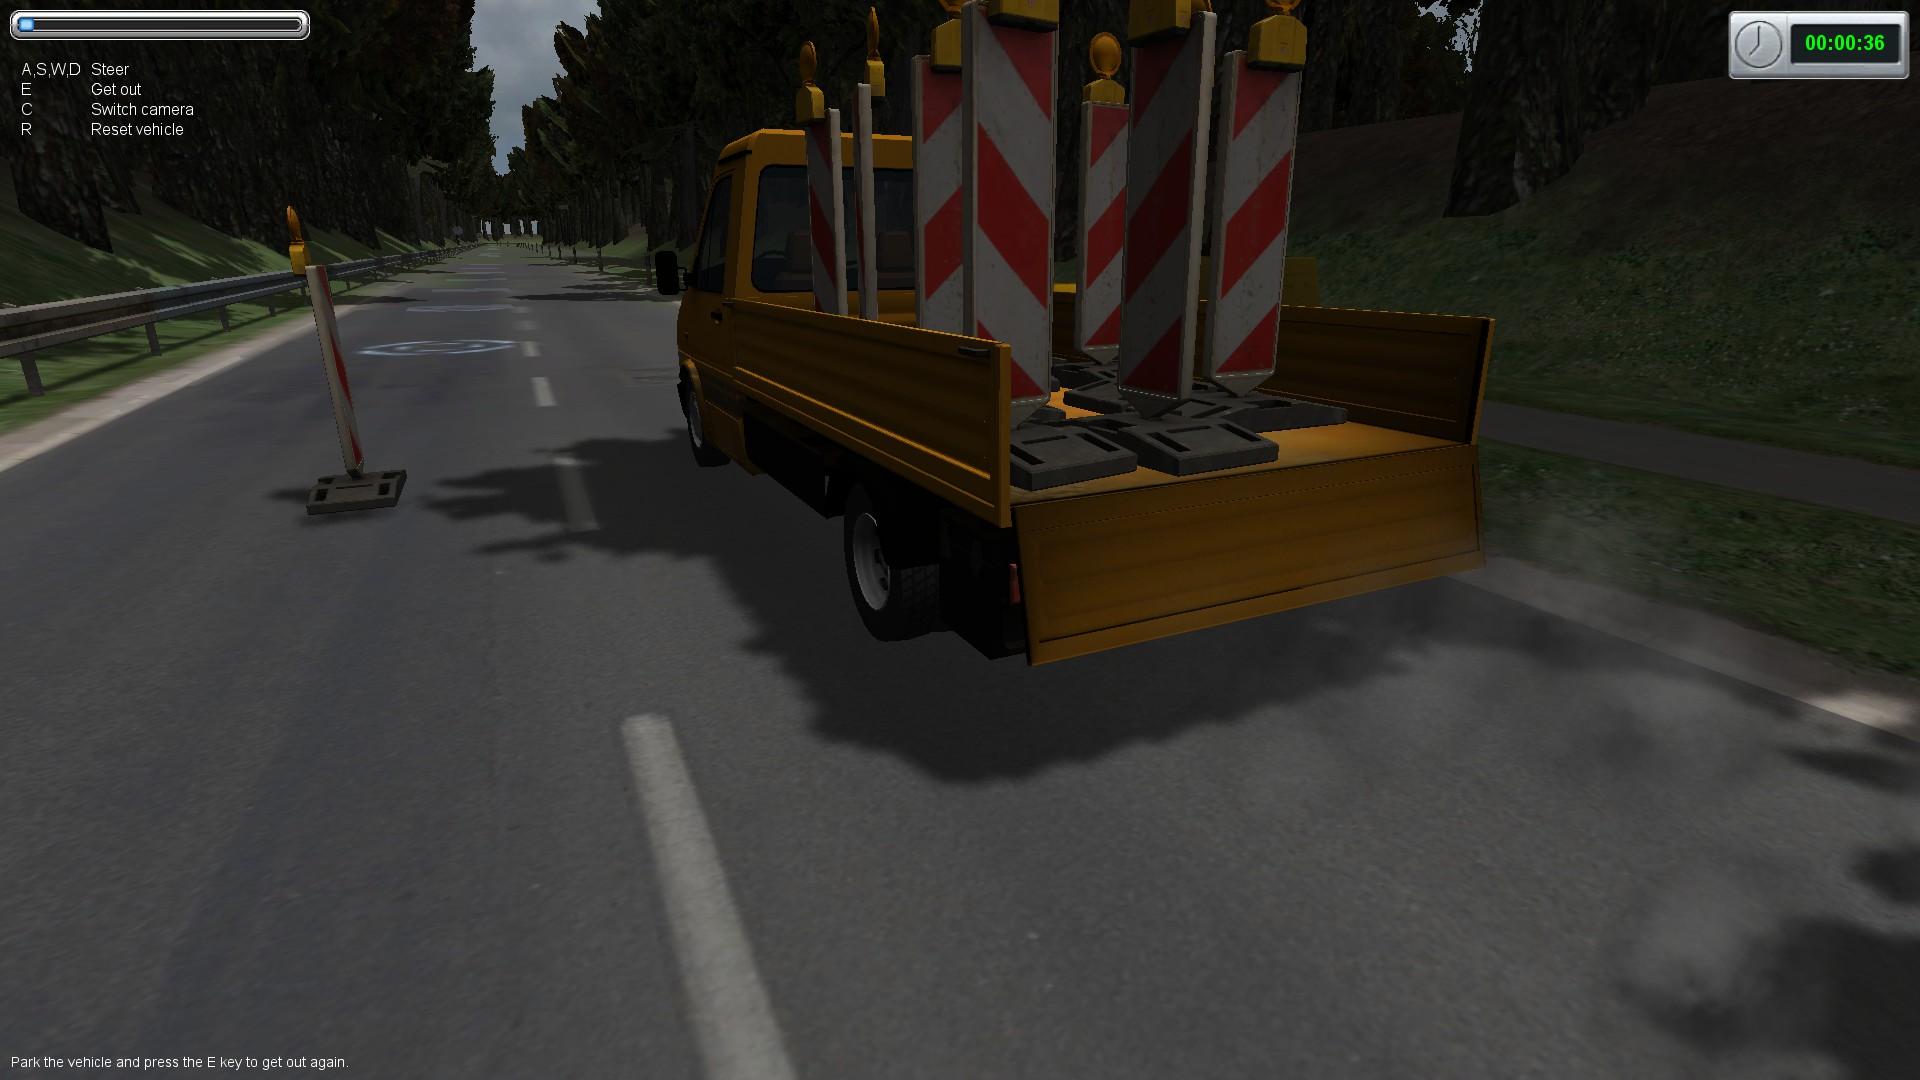 Roadworks - The Simulation screenshot